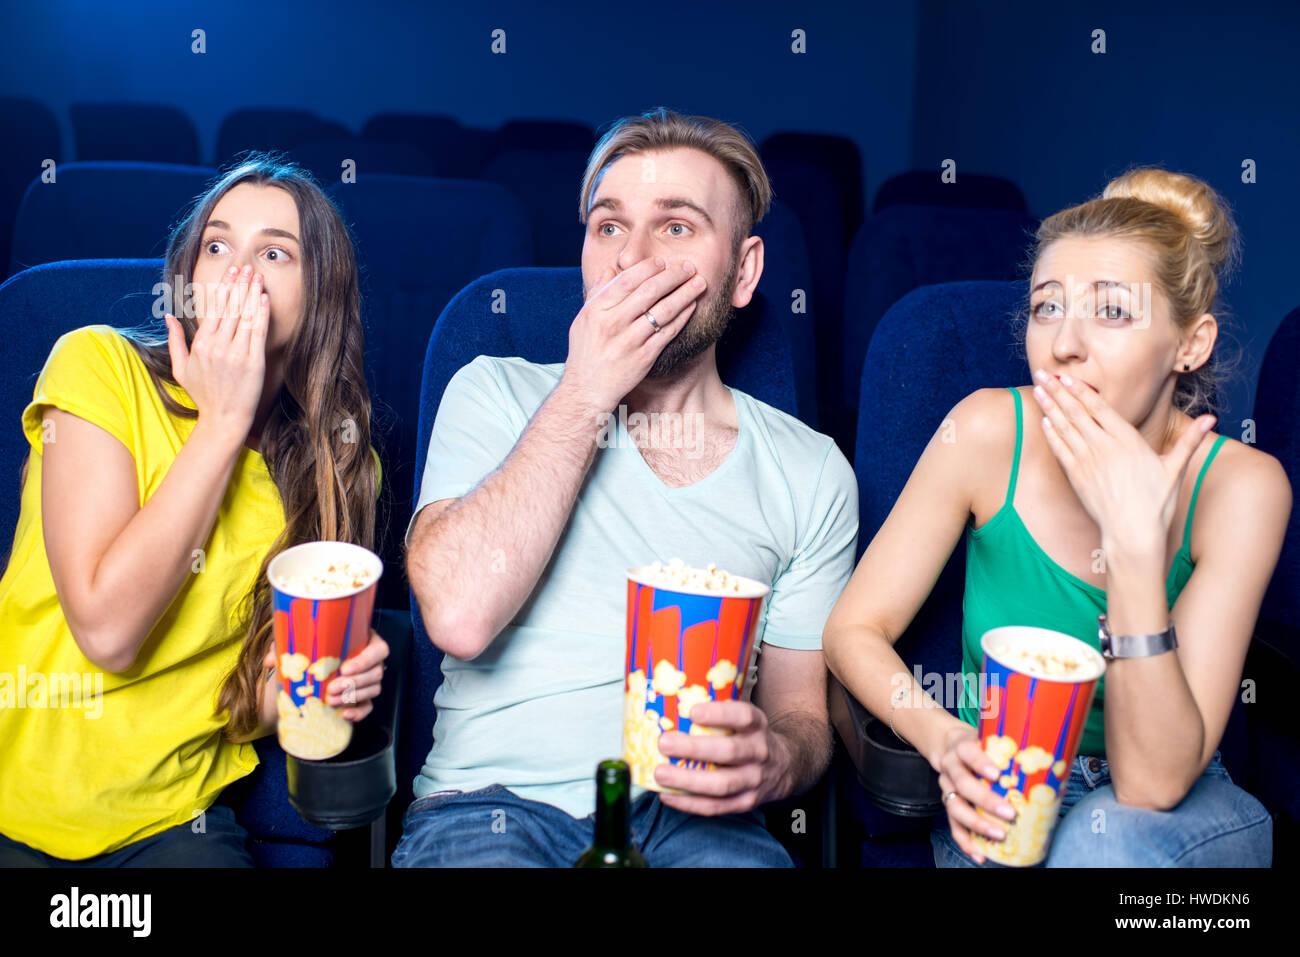 Friends in the cinema Stock Photo